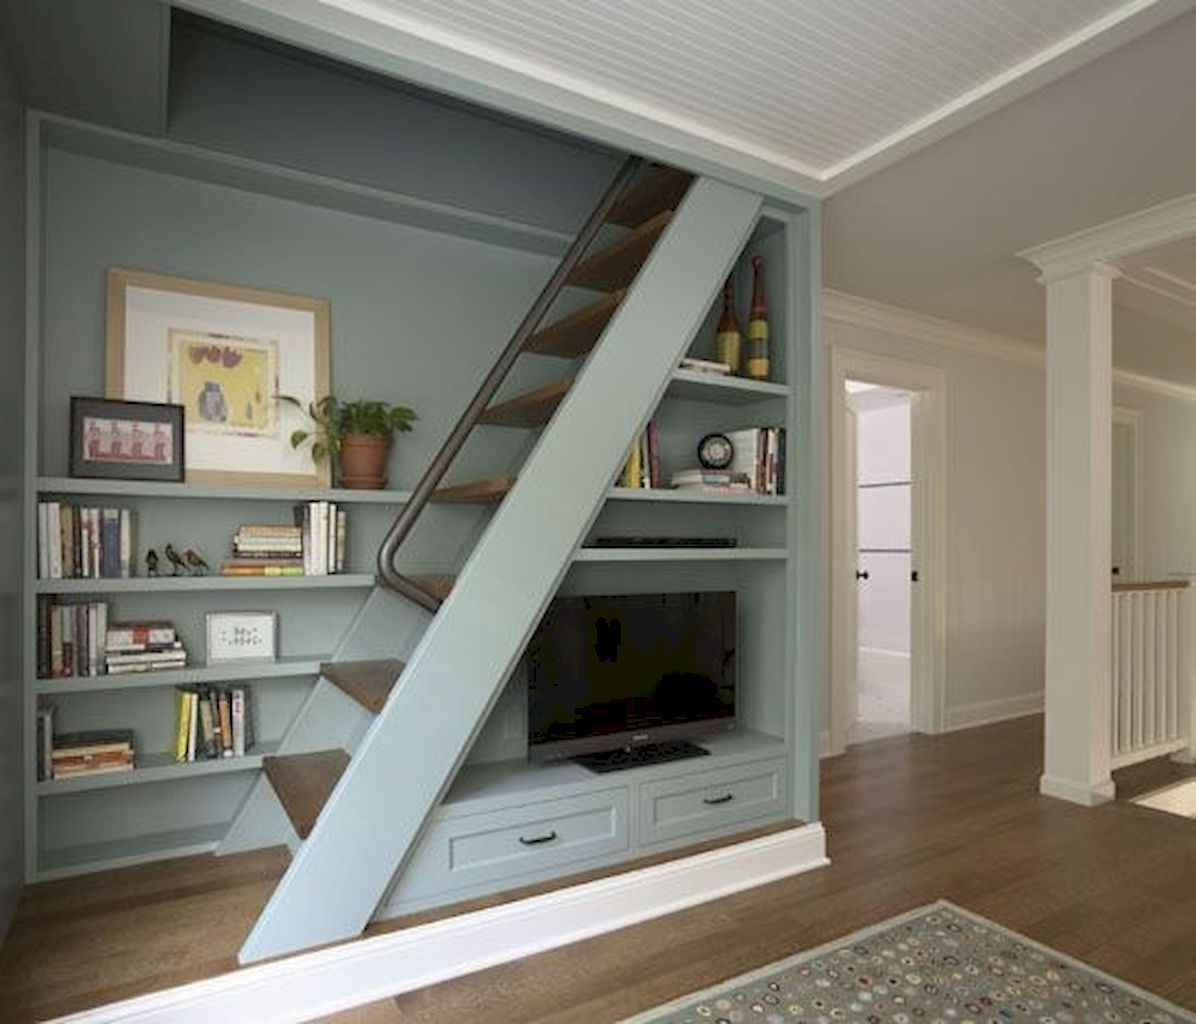 Creative loft stair with space saving ideas (79)